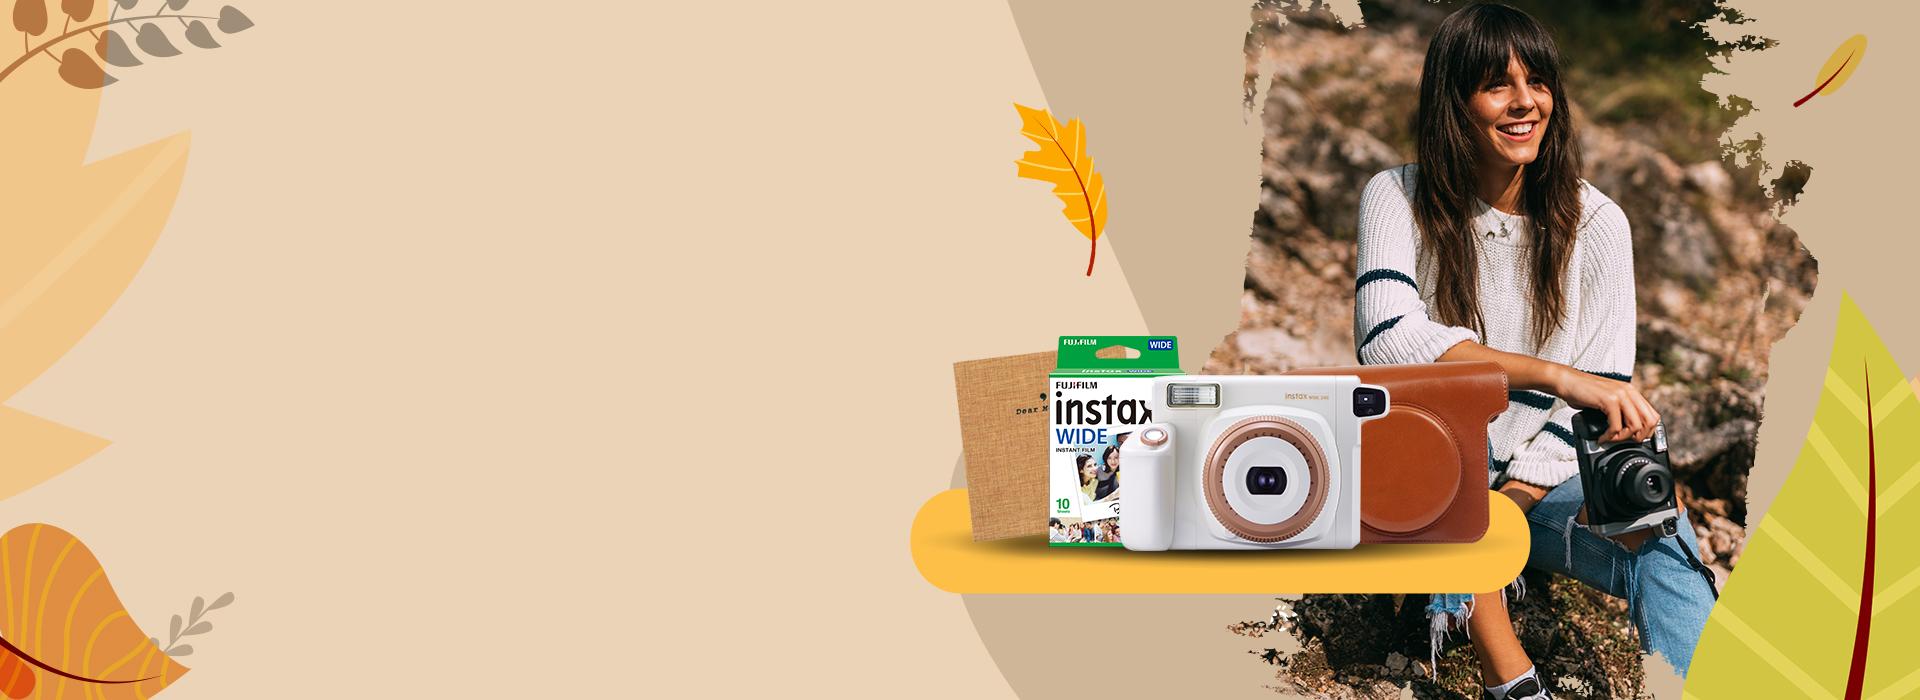 Instax WIDE 300 őszi csomag